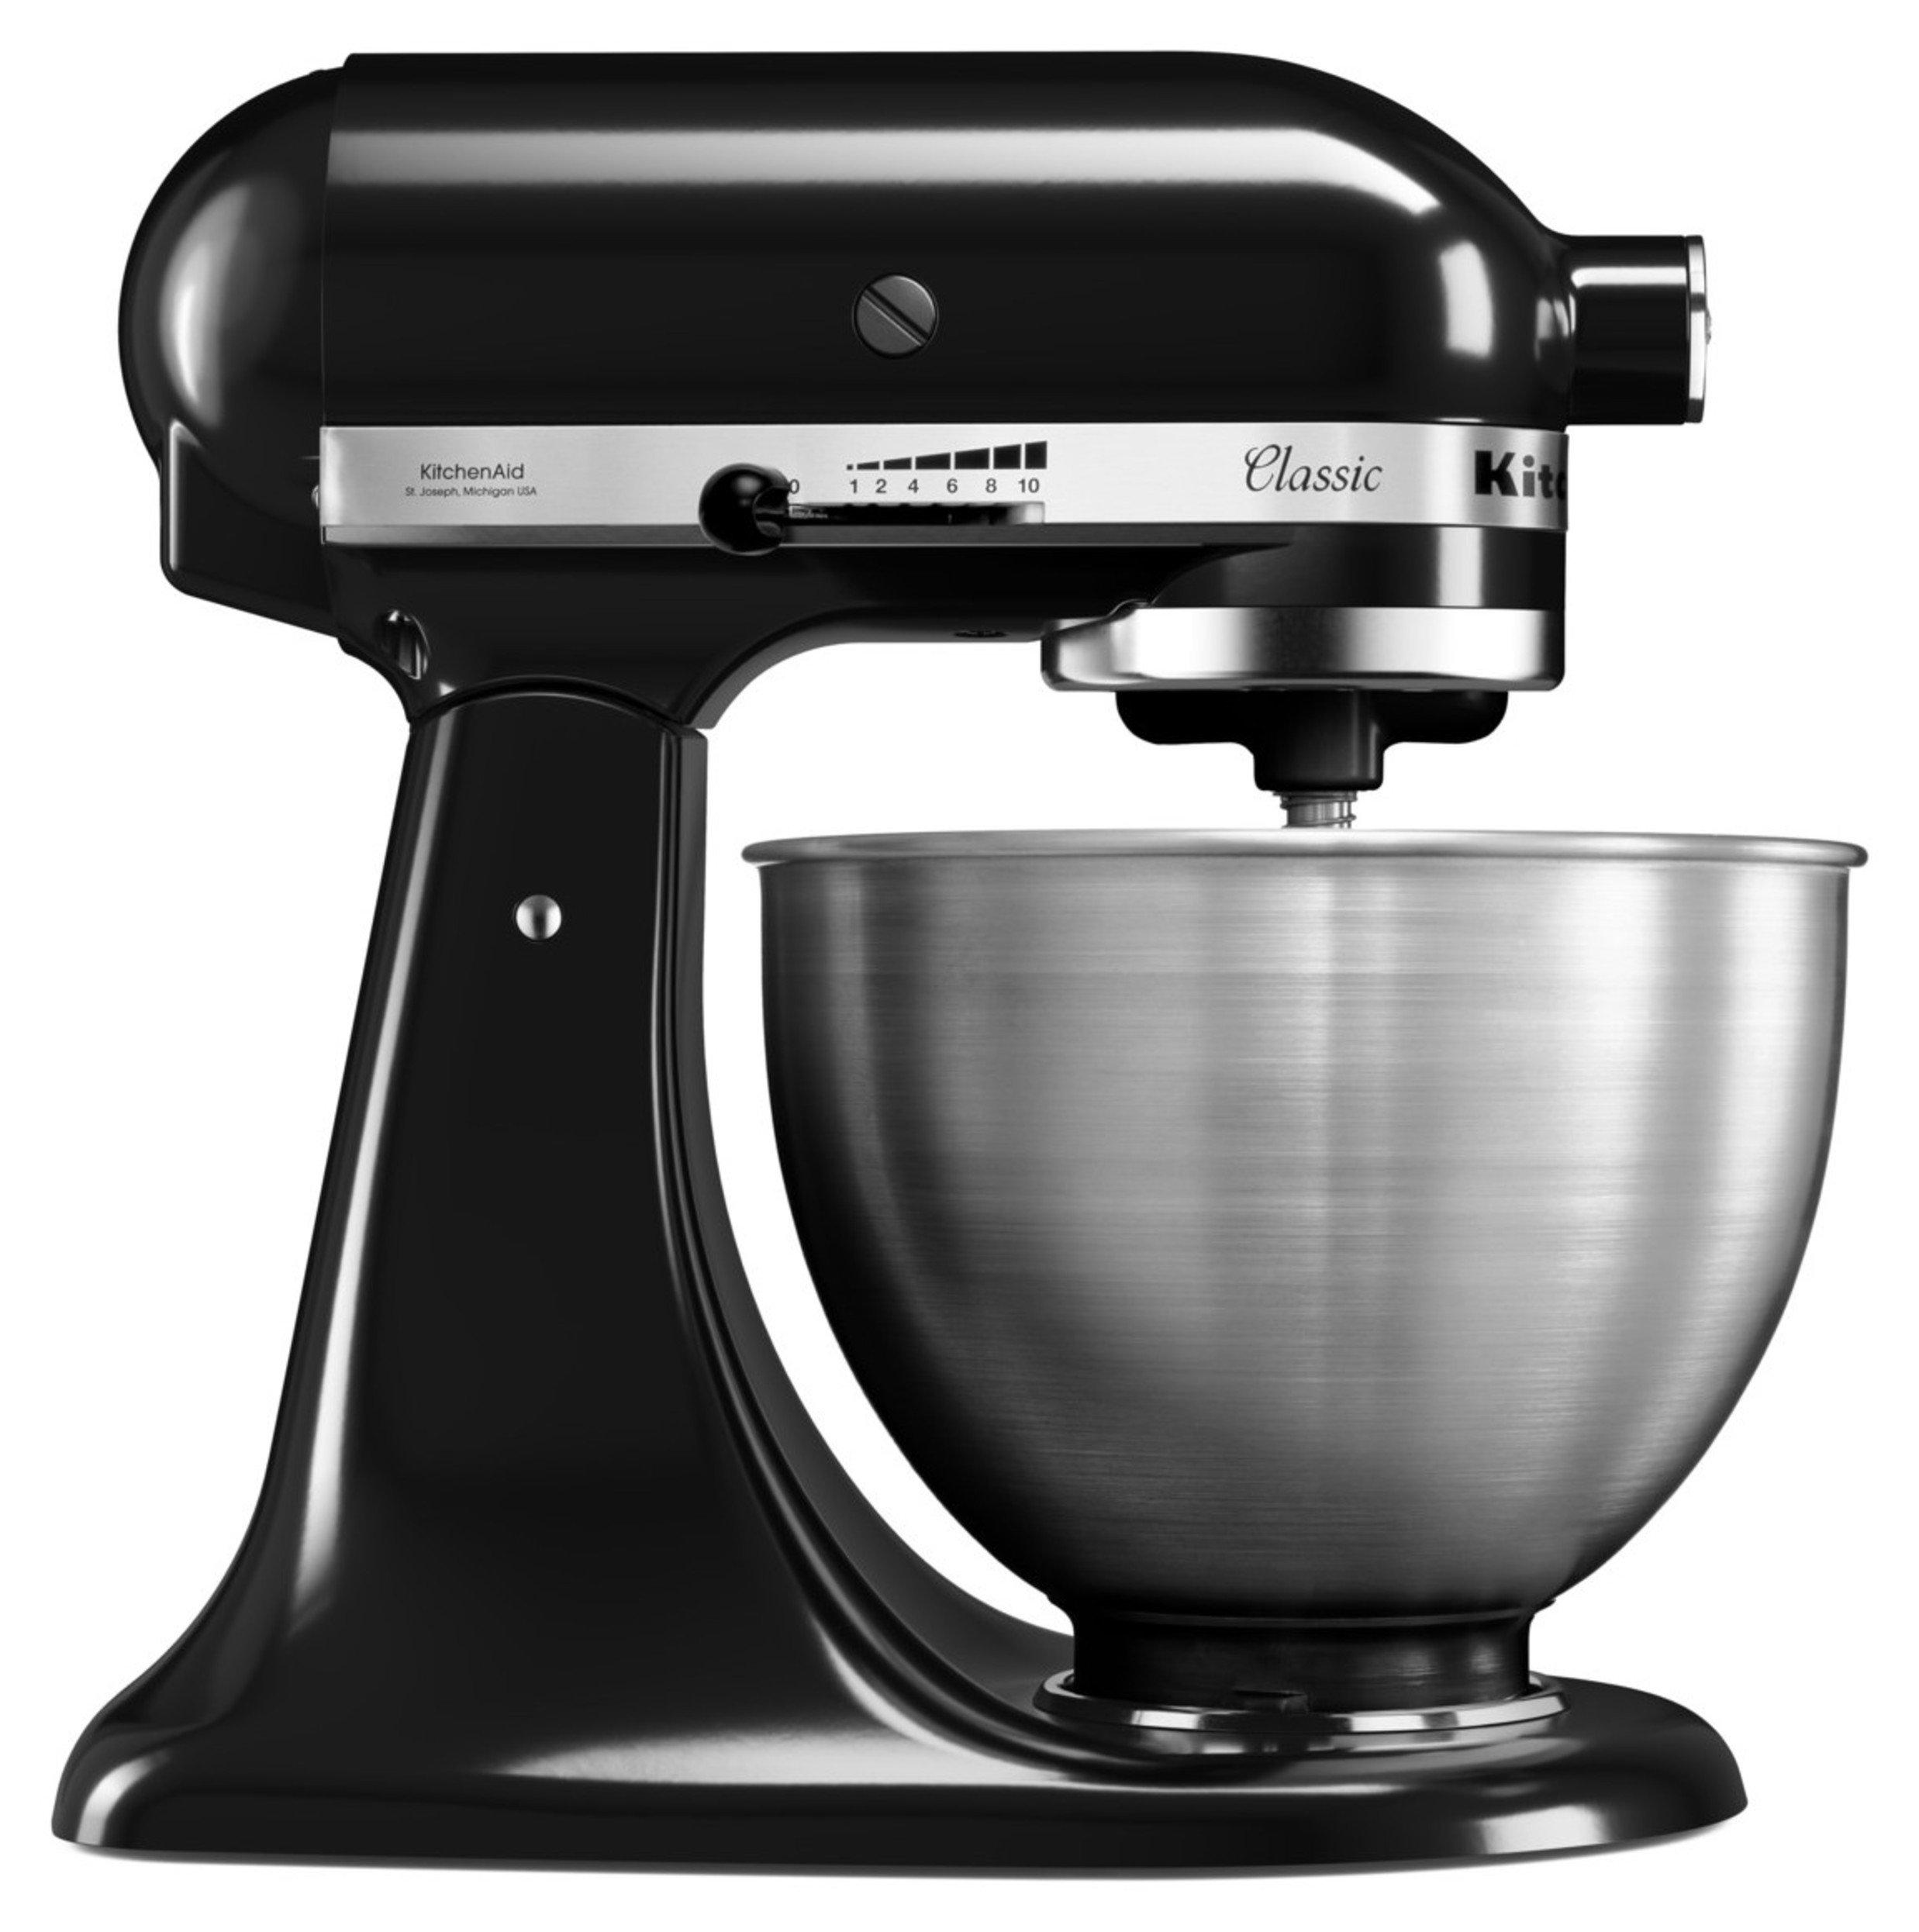 KitchenAid Classic Stand Mixer - Black